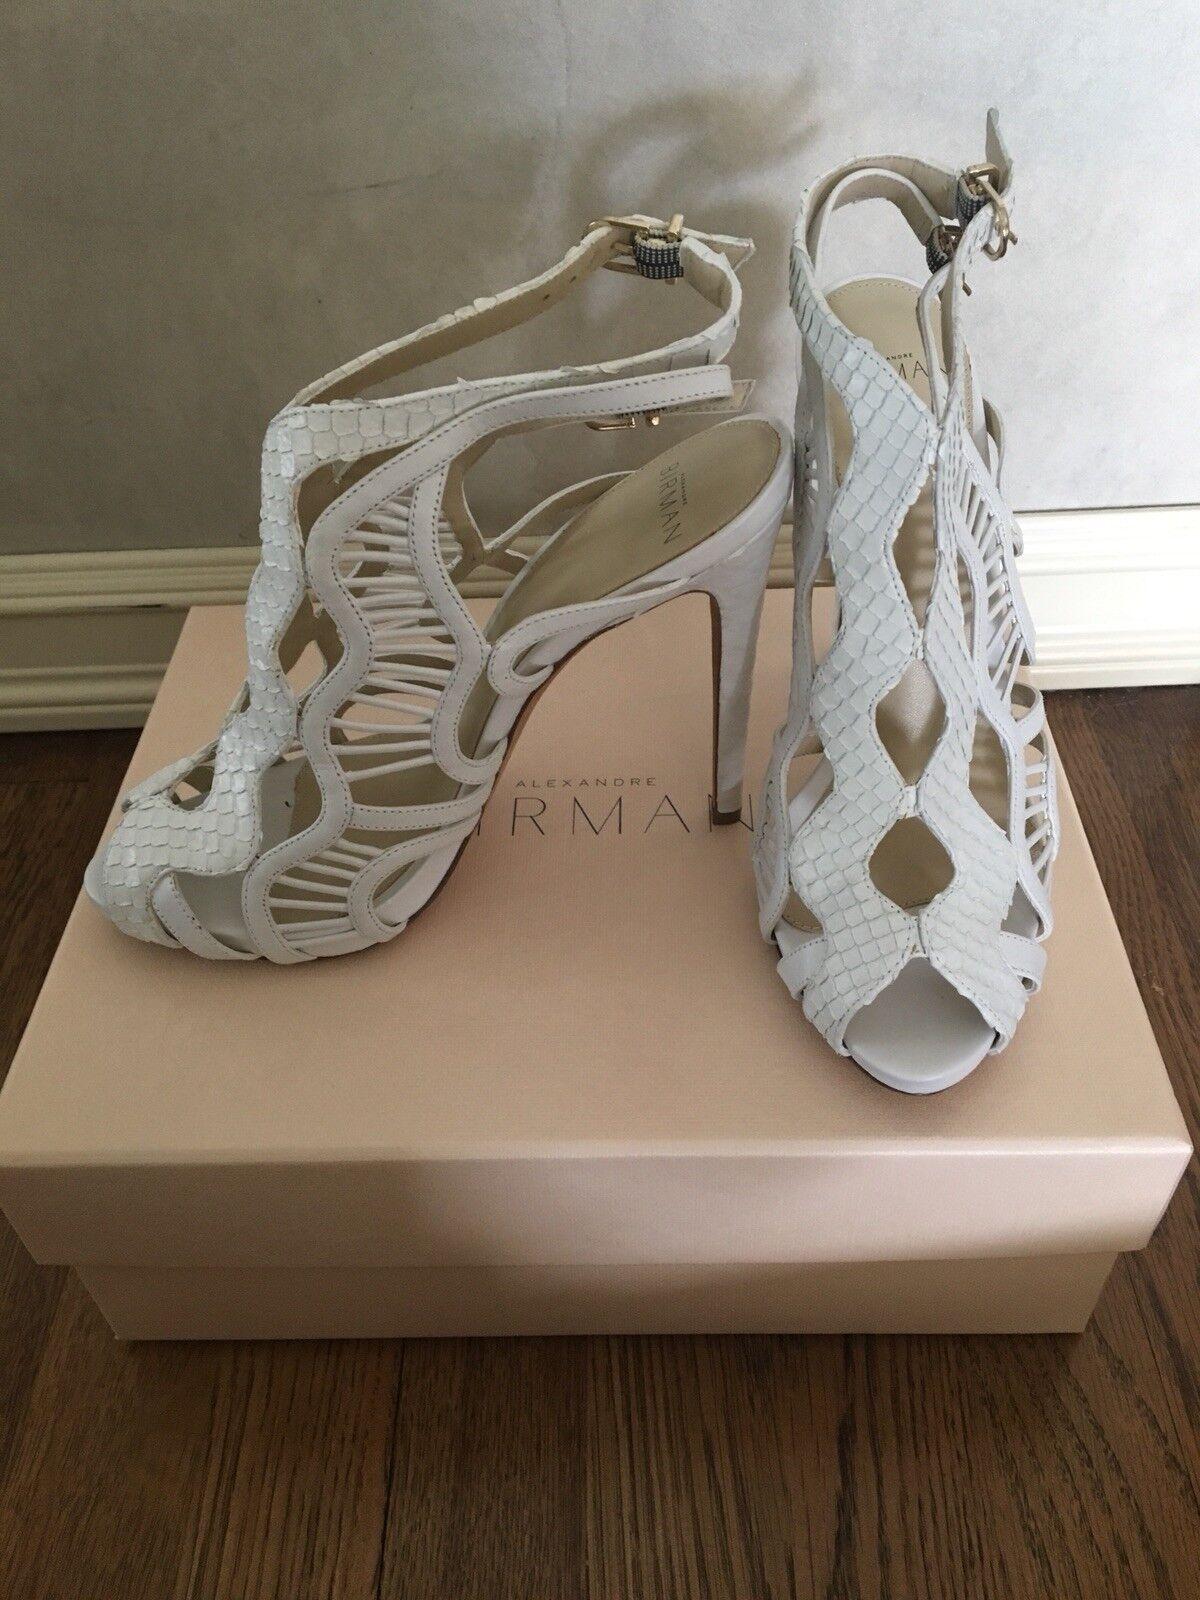 Alexandre Birman Loretta Python Sandal White Snakeskin 8.5US - amazing condition